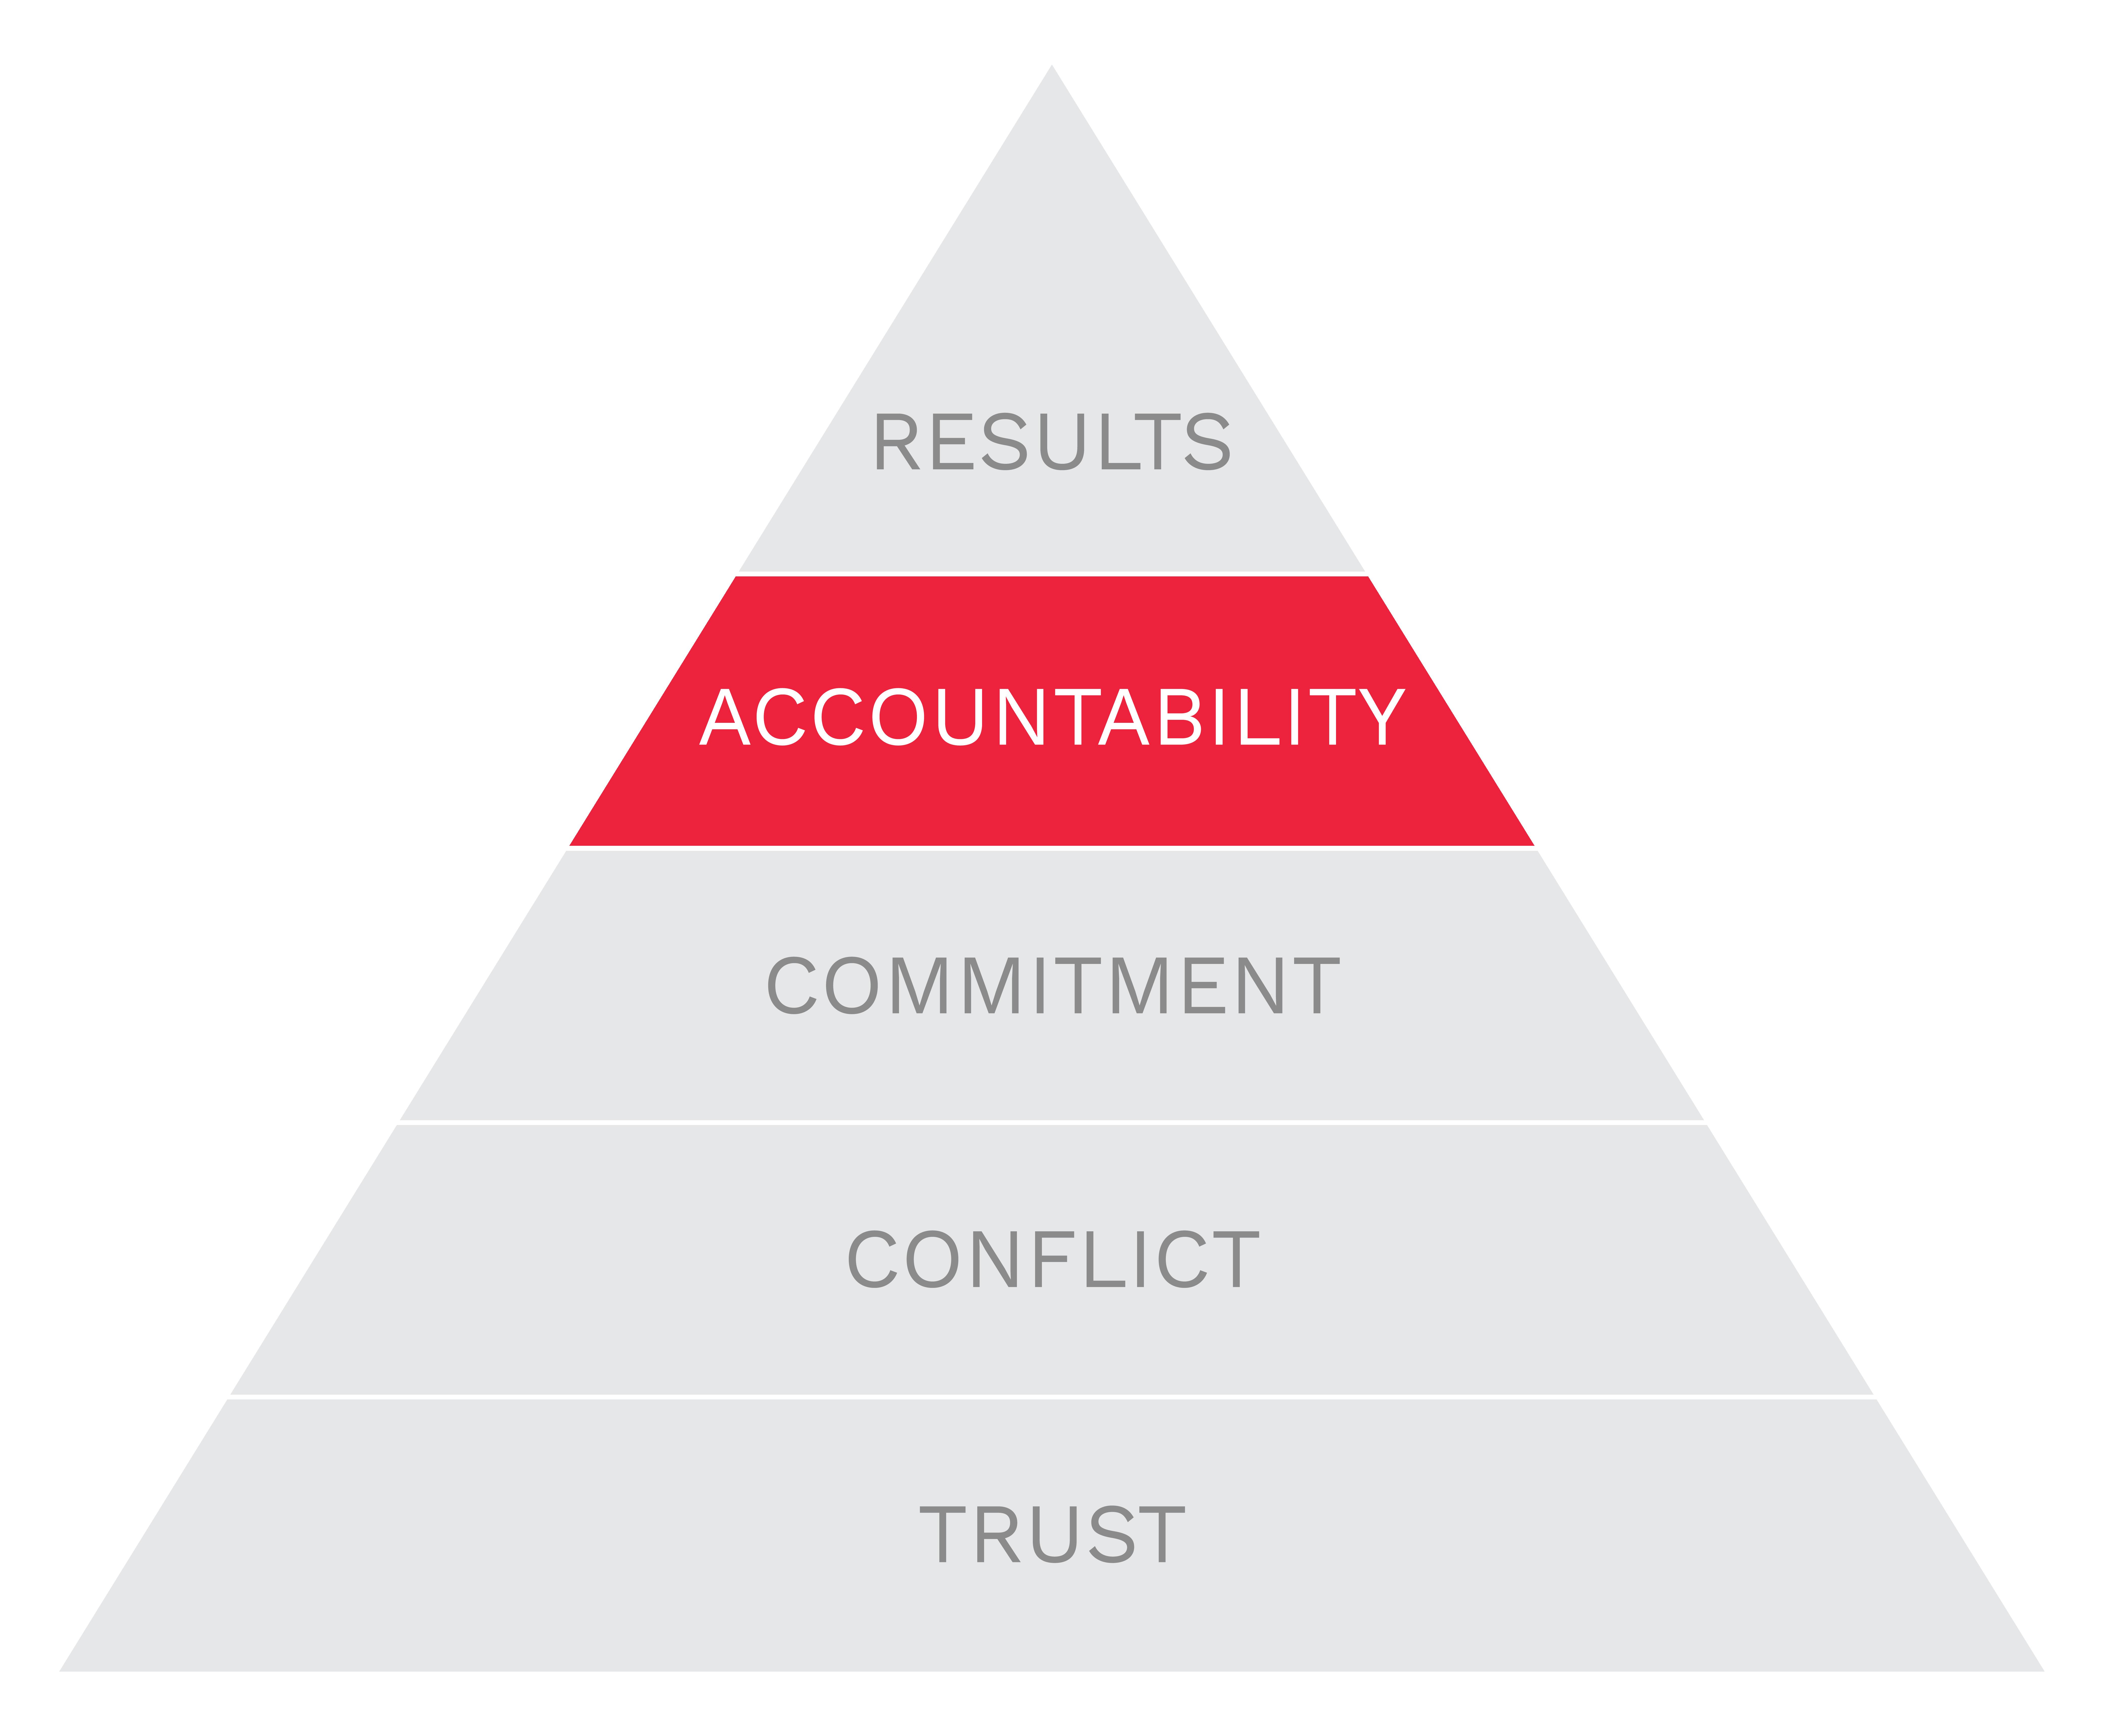 5b-branding-pyramid-accountability.png